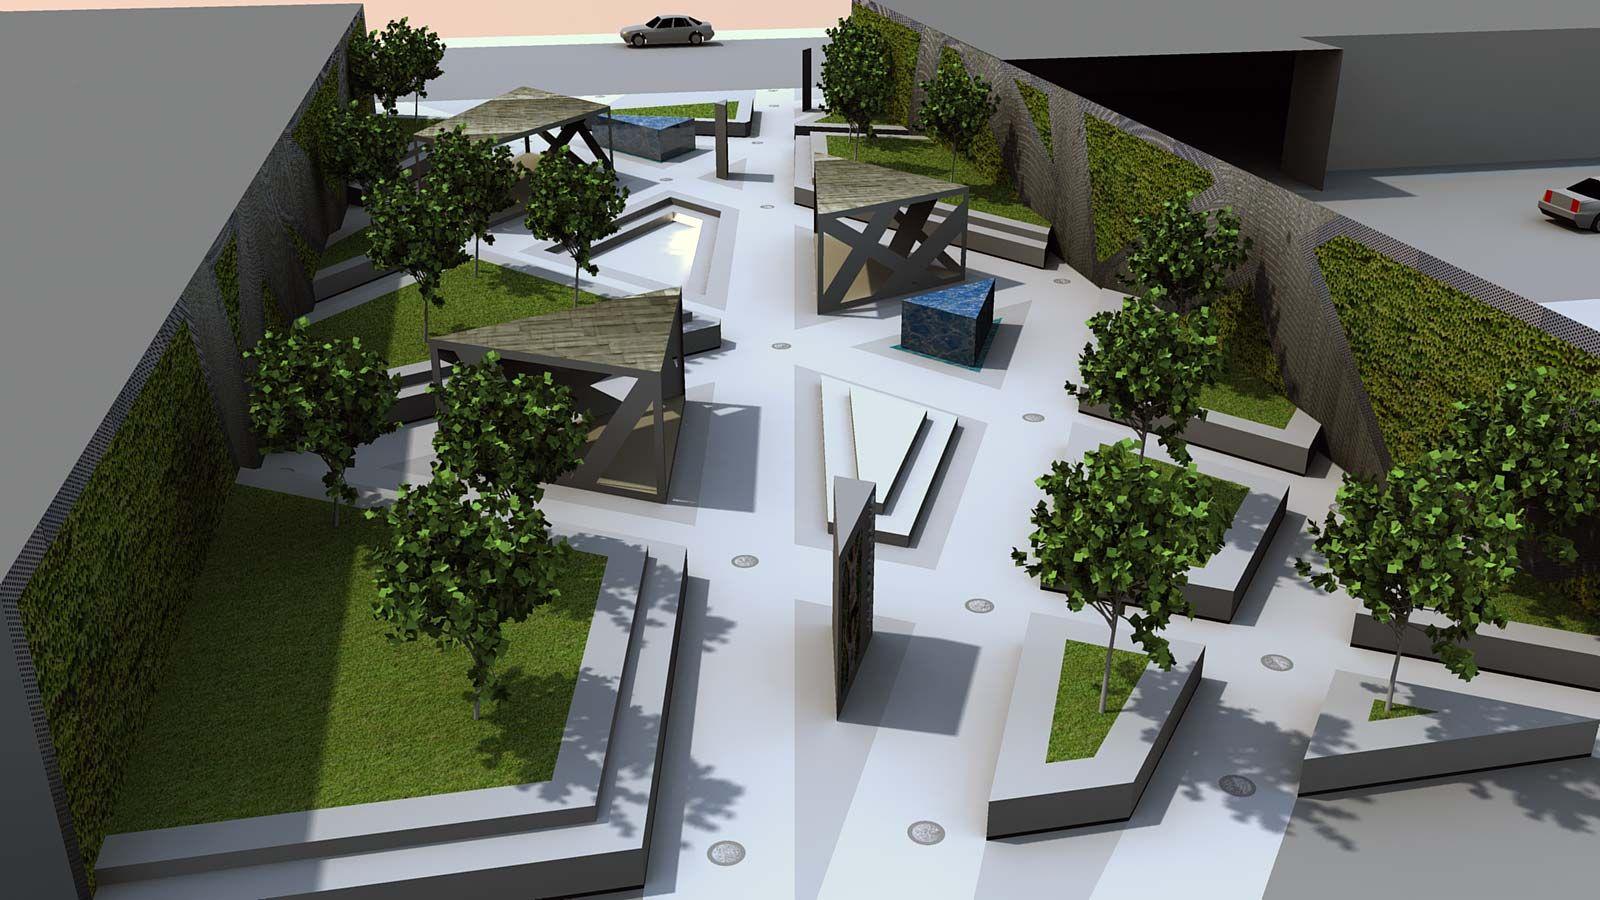 urban park design future man infrastructure parking design rh pinterest com modern industrial park design modern urban park design